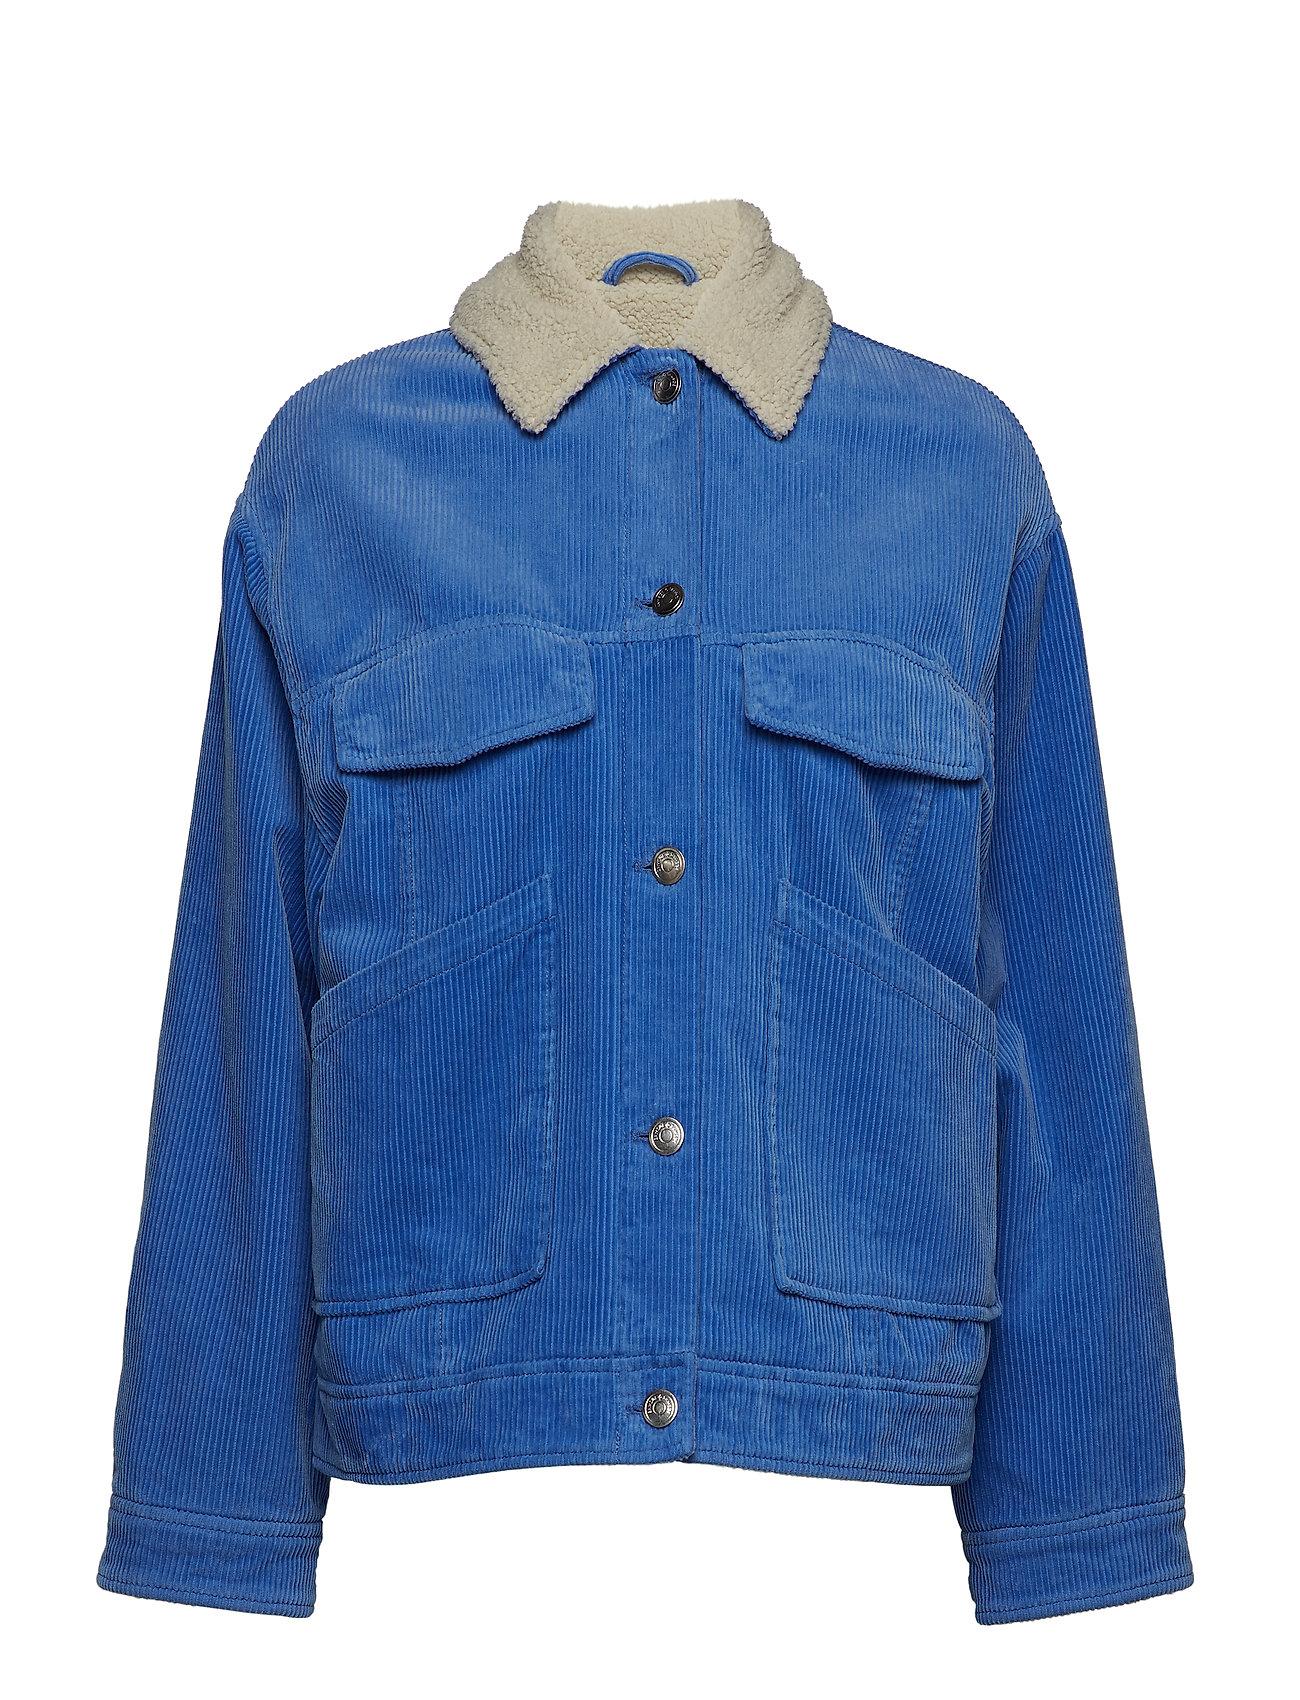 Samsøe & Samsøe Venya jacket 10690 - BLUE BONNET